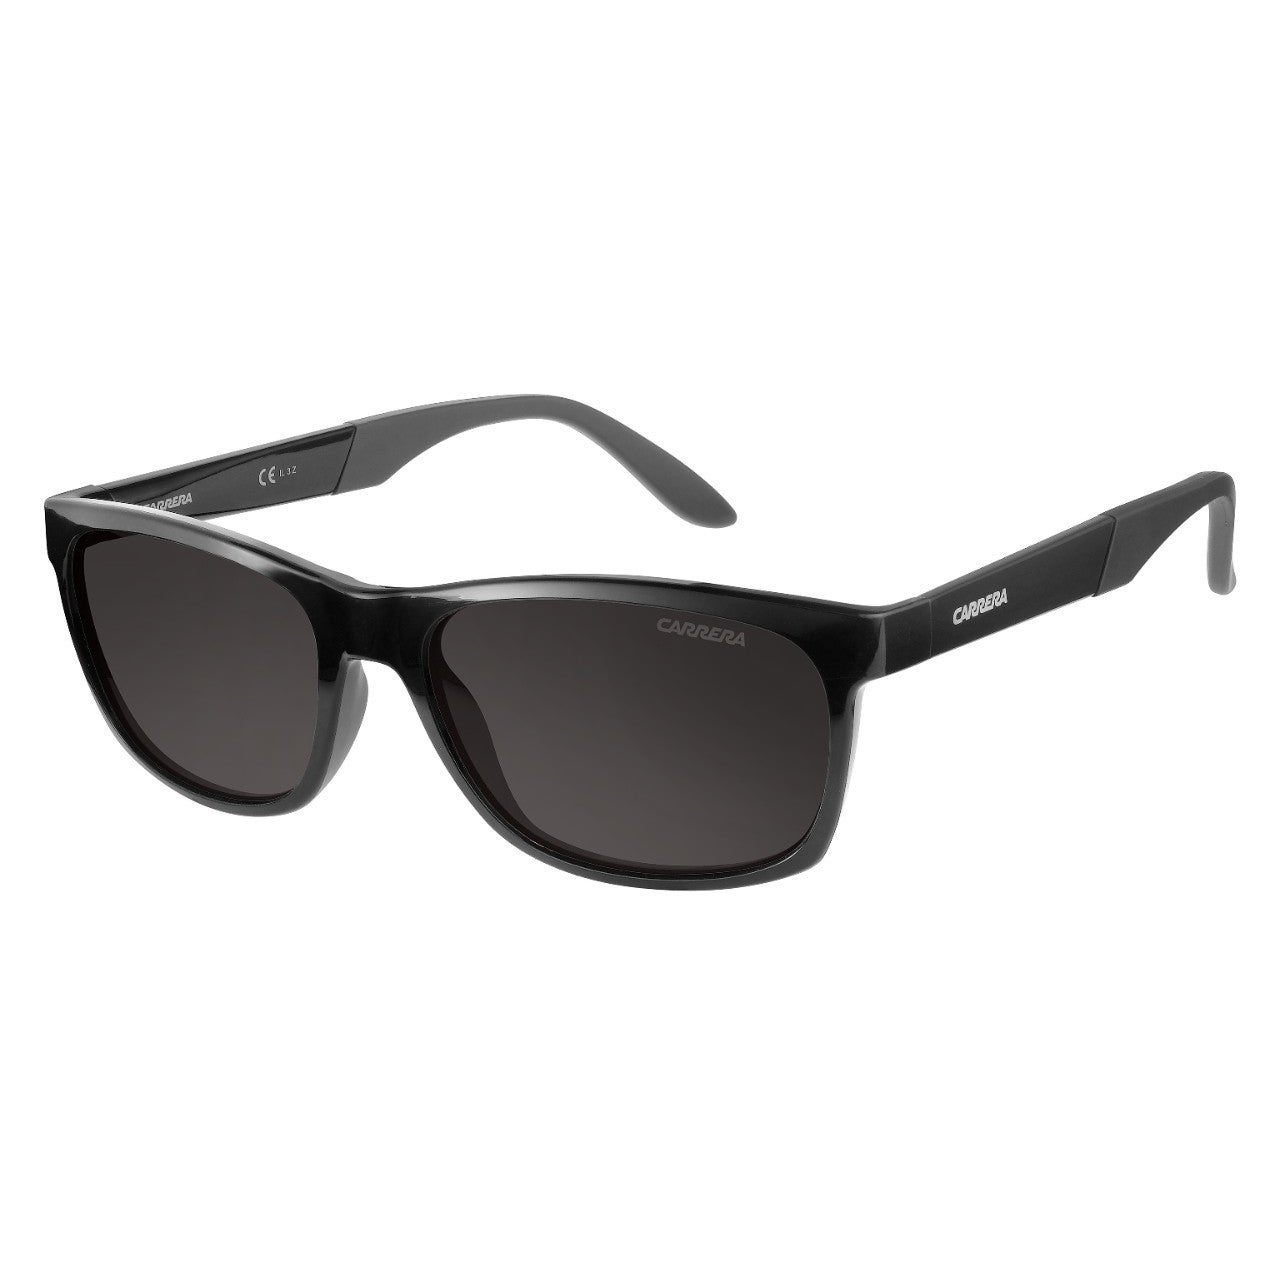 fda209900ed Shop Sunglasses Black Today 16816747 Free Polarized Grey Shipping Plastic  Frame Lens Carrera Men s qqT6wrAZ